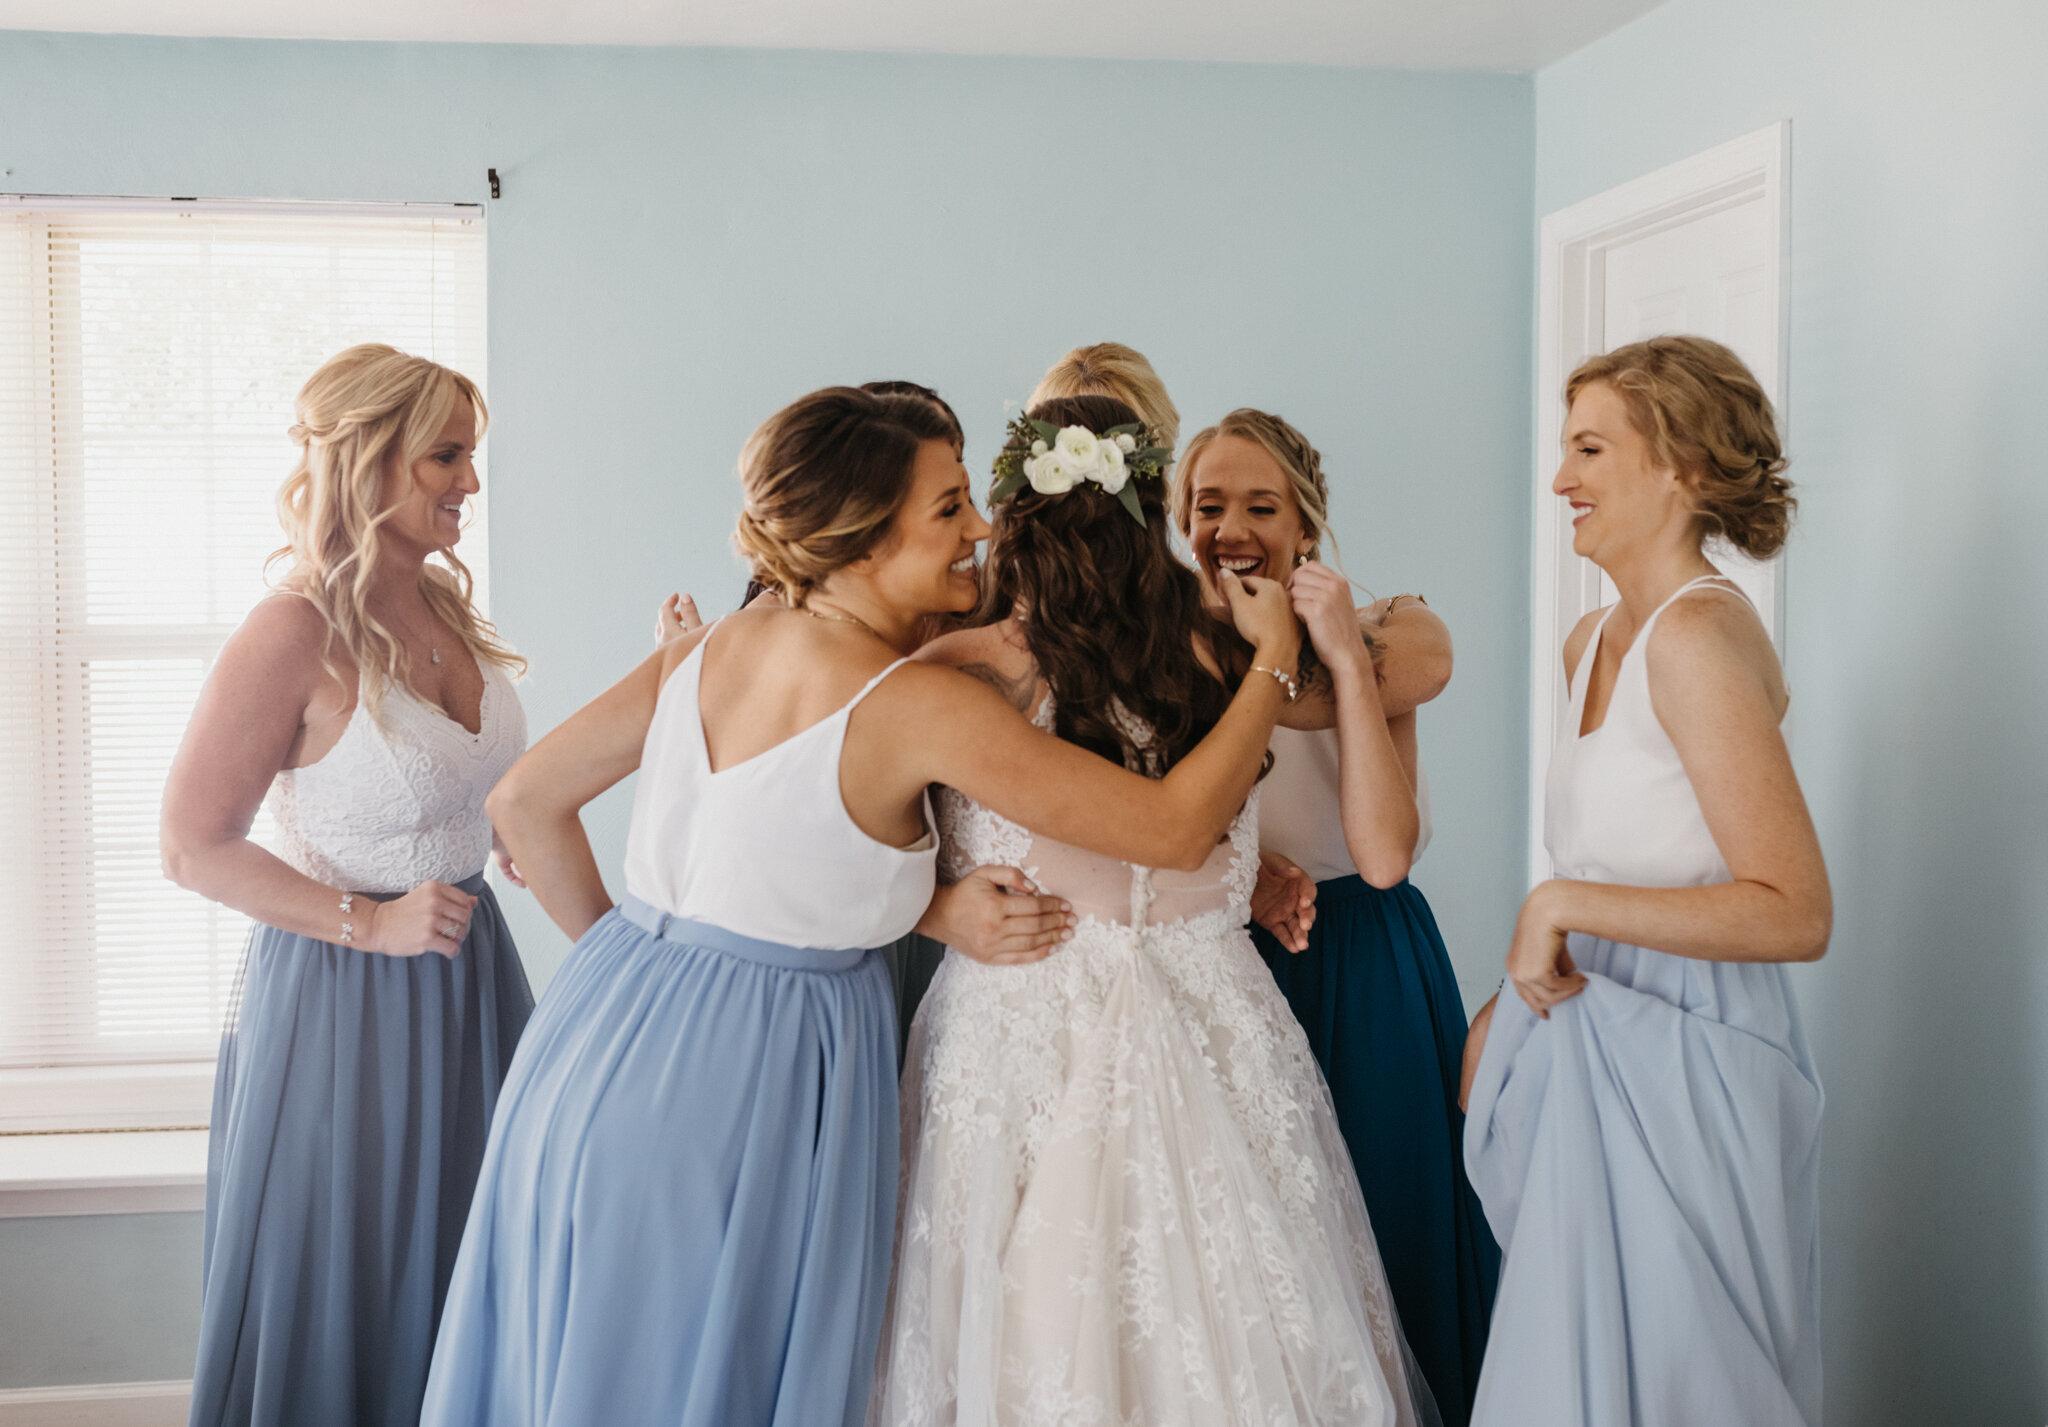 angela_jason_norfolk_wedding-31.jpg